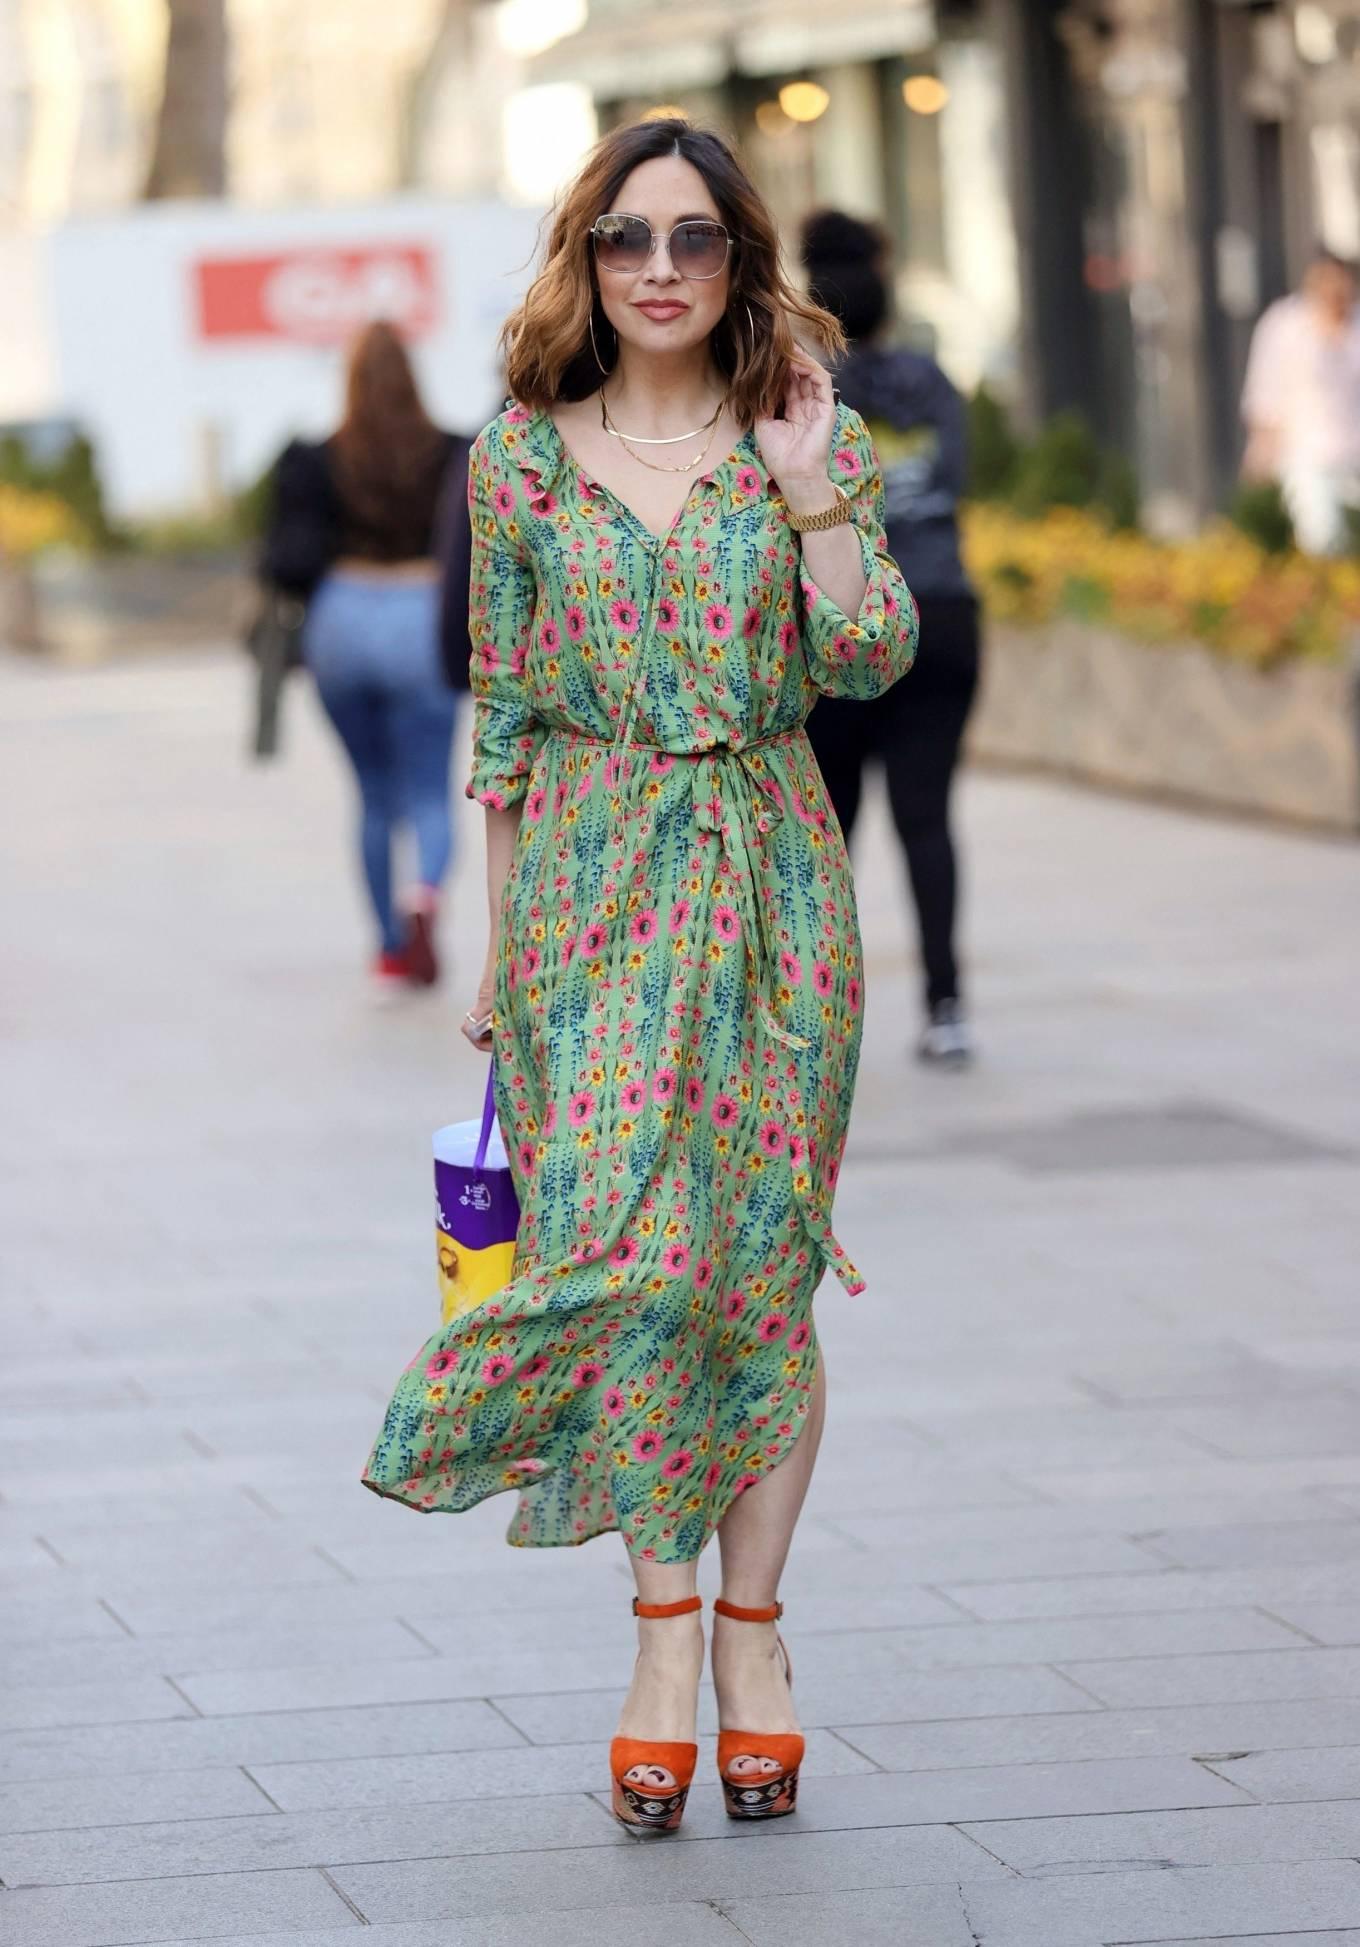 Myleene Klass - In retro summer dress at Smooth Radio in London